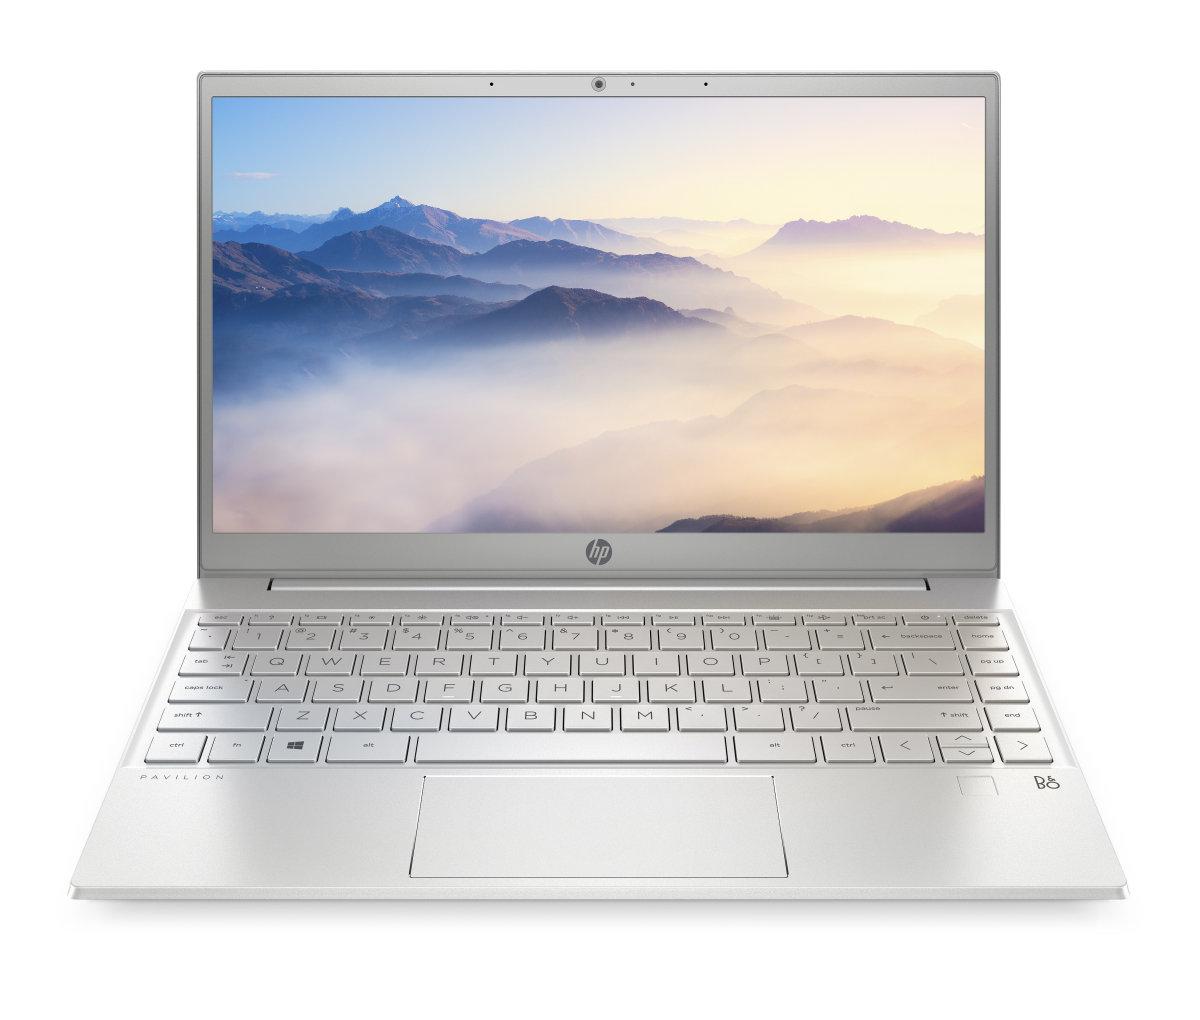 "HP NTB Pavilion 13-bb0001nc/13"" IPS FHD BW/Core i5-1135G7/8GB/256GB SSD/Iris Xe/ac/BT5/3y/Win 10 Home/Natural-silver"